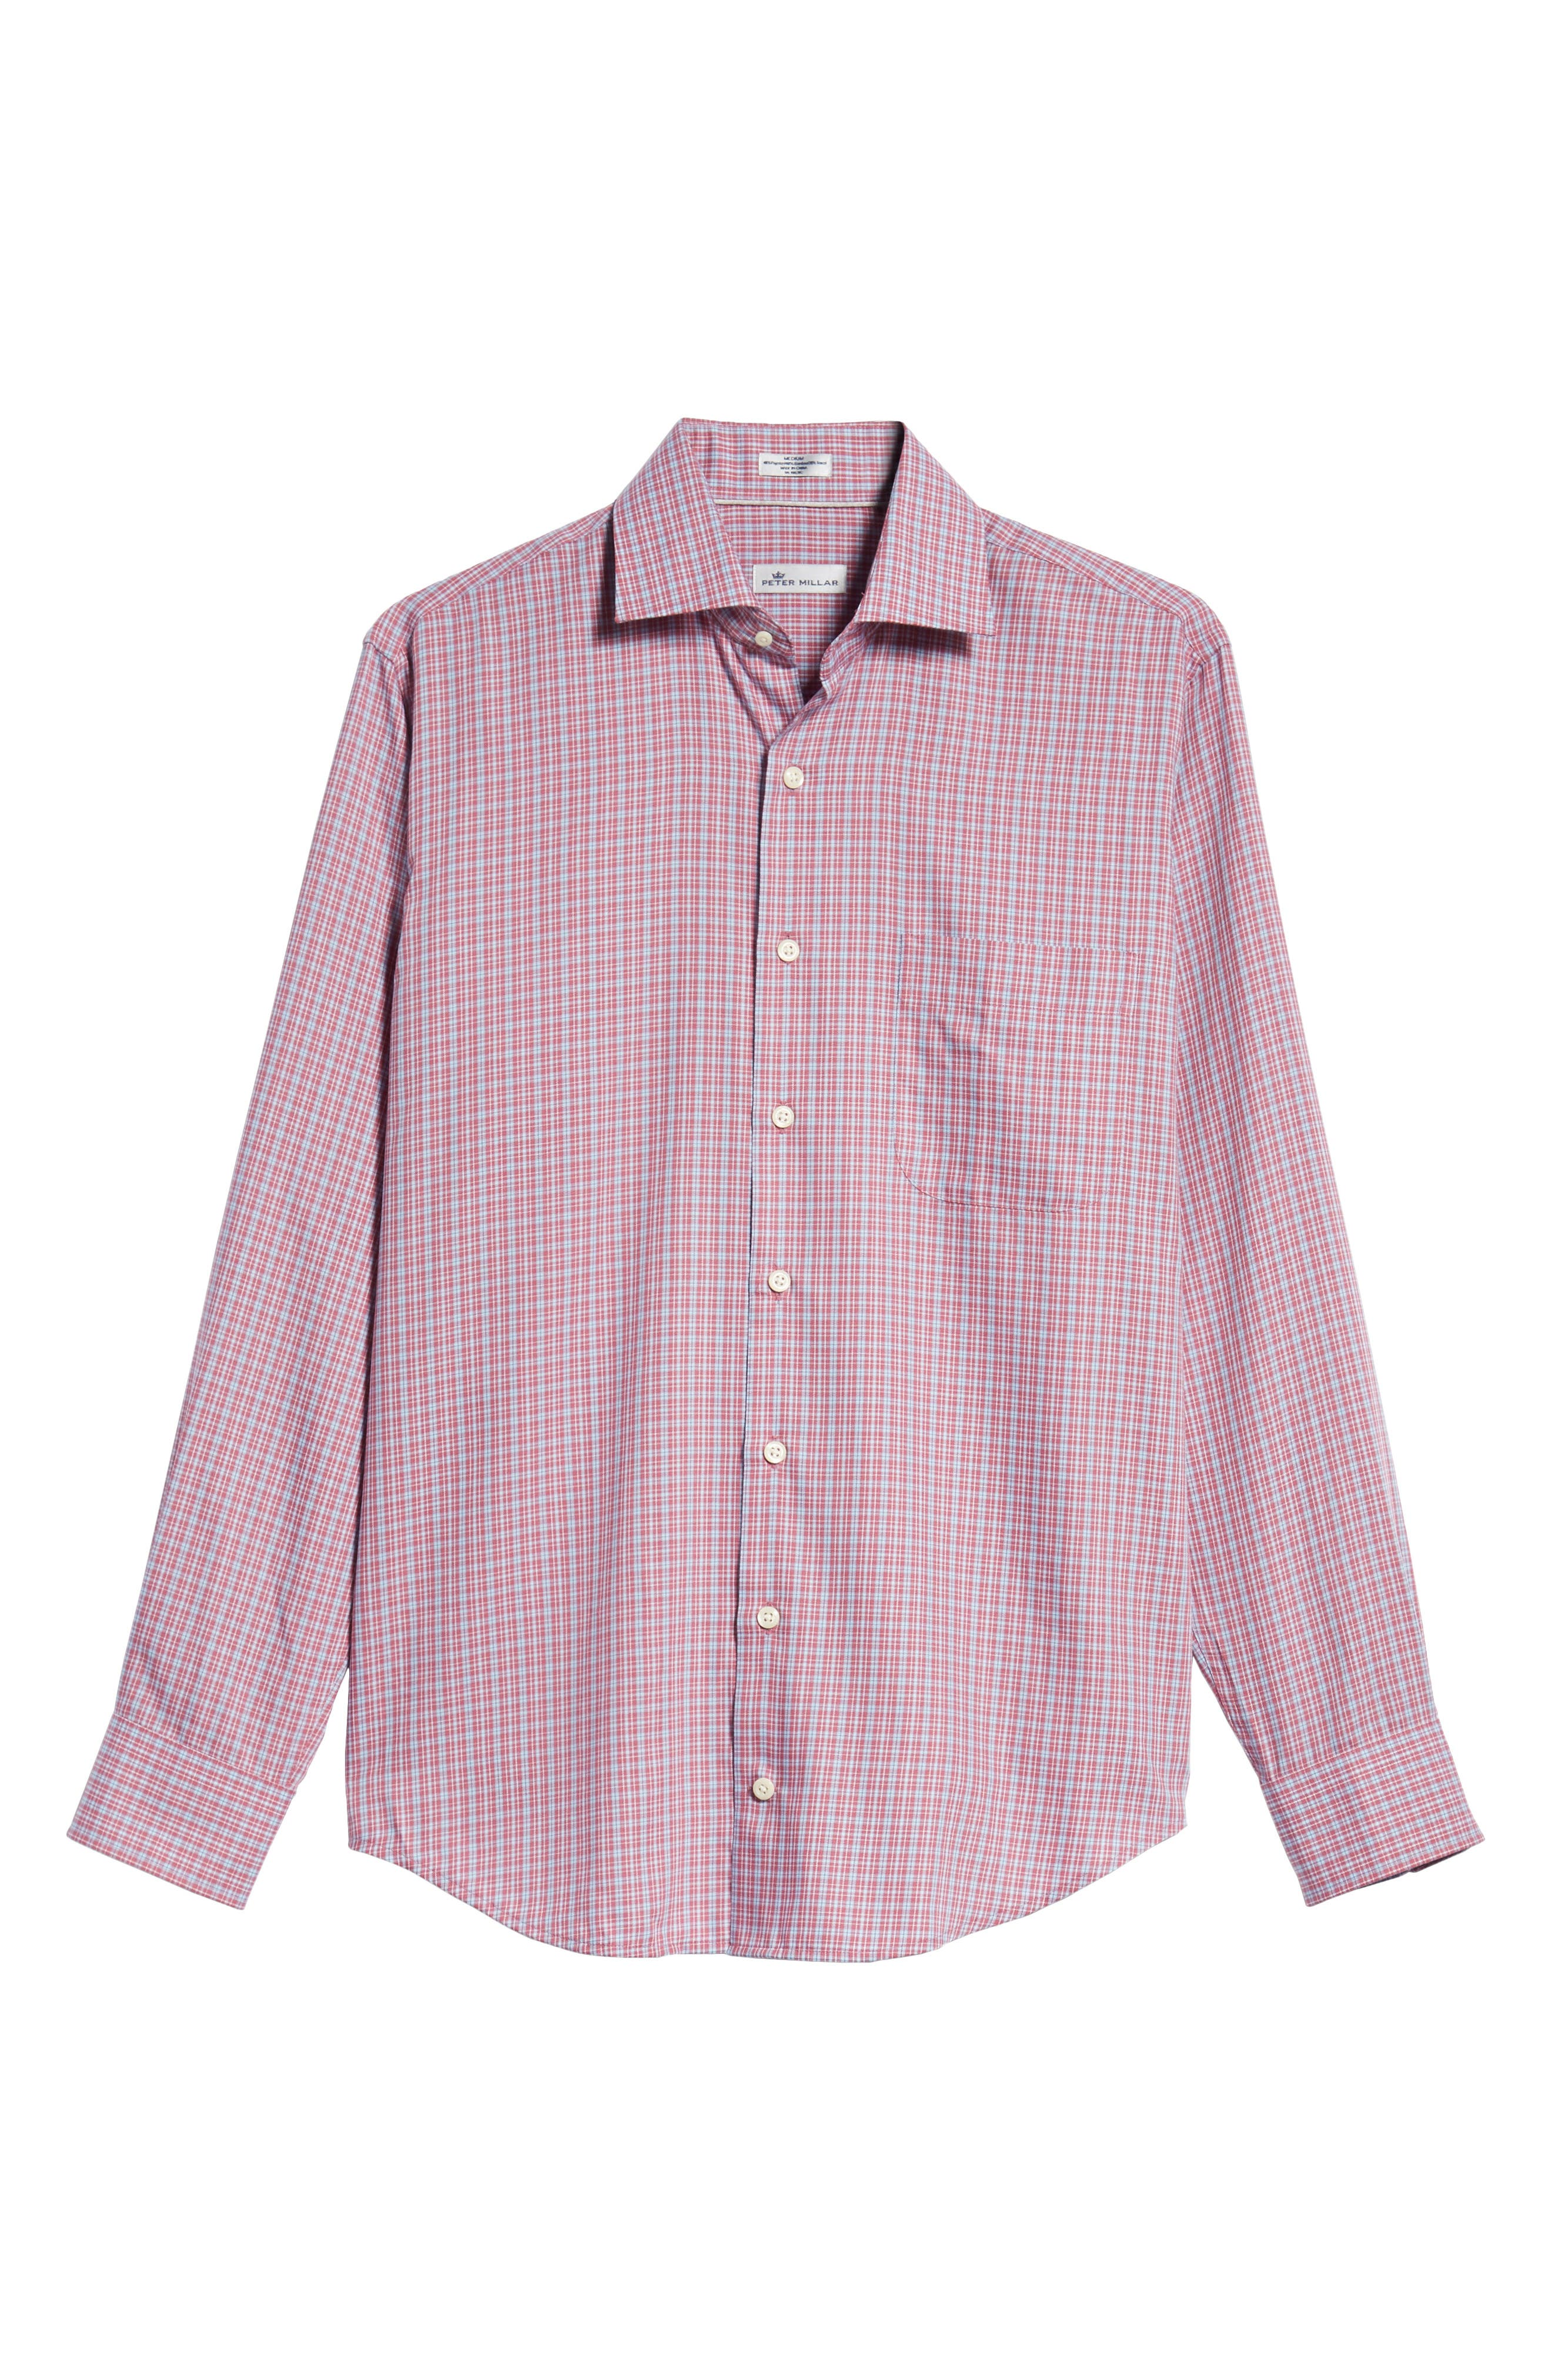 Province Regular Fit Check Sport Shirt,                             Alternate thumbnail 5, color,                             PINK